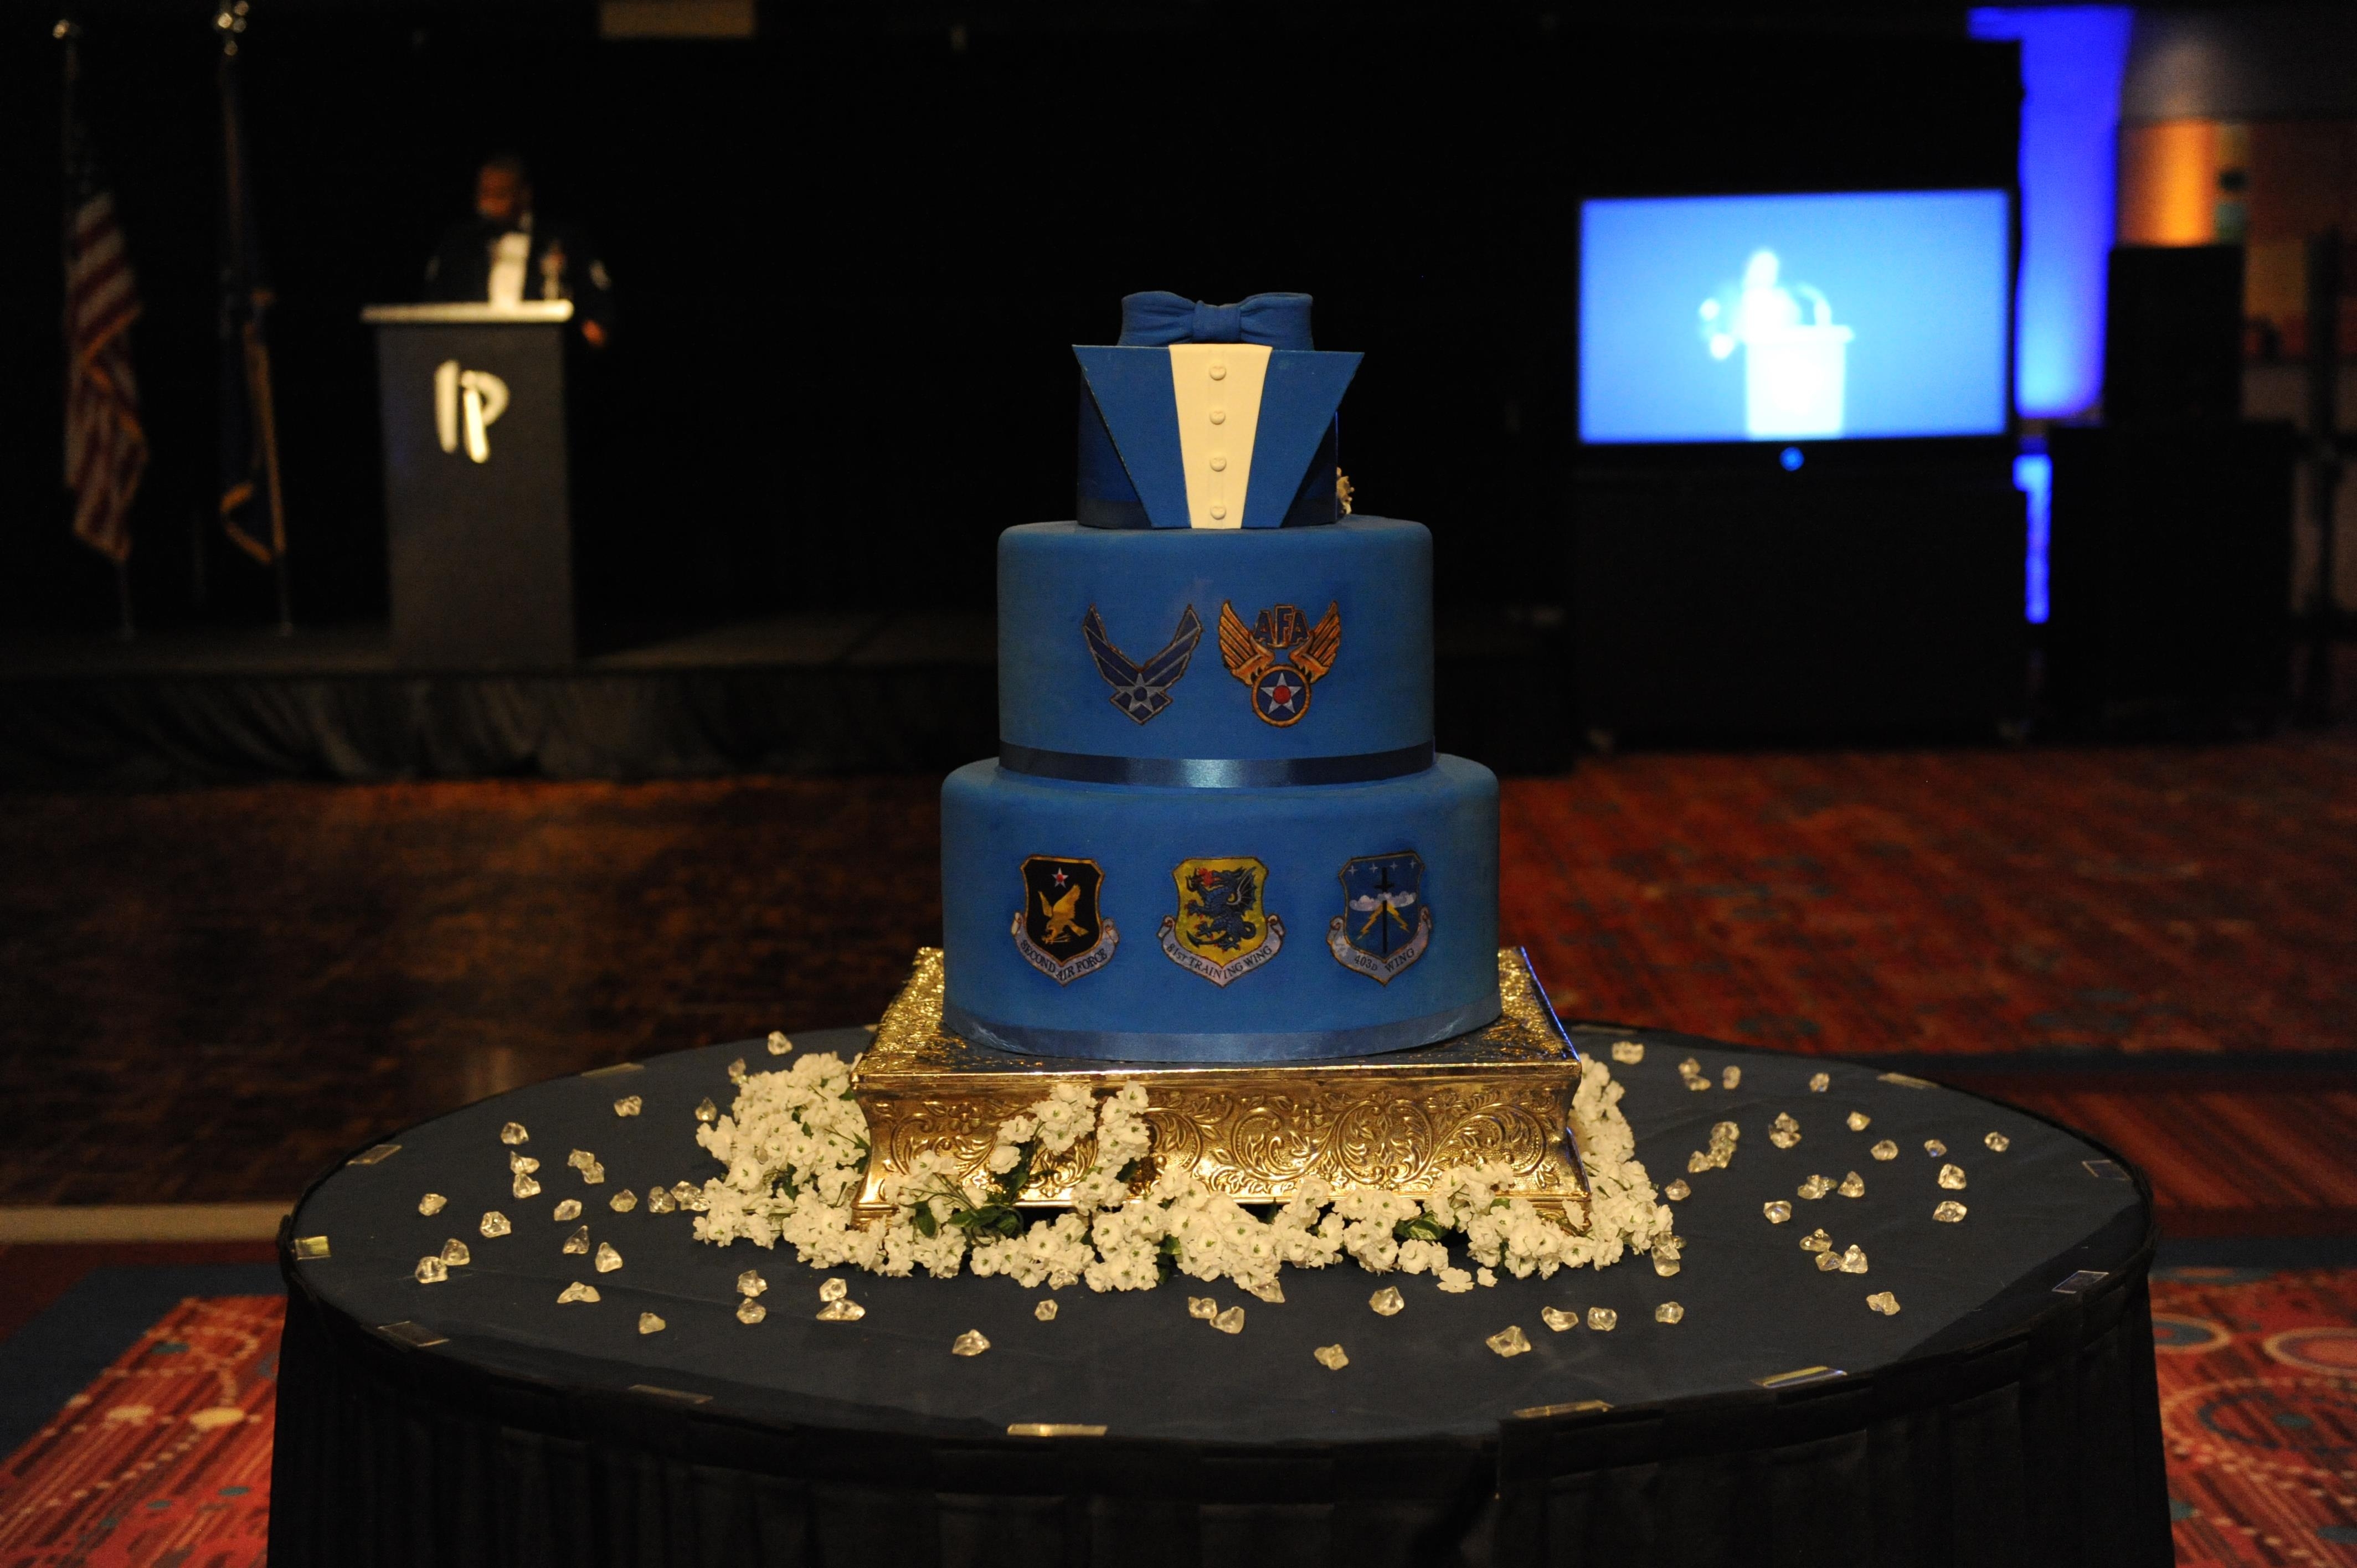 Air Force Birthday Cake